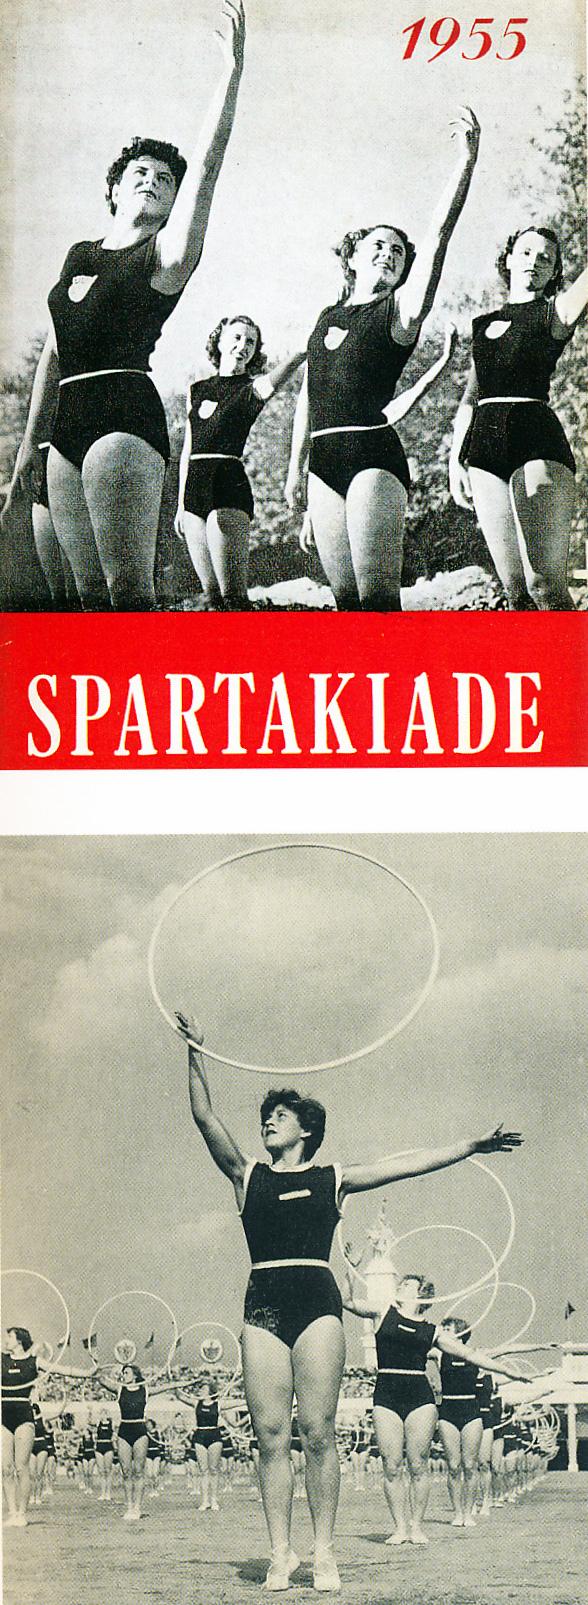 Spartakiade 1955